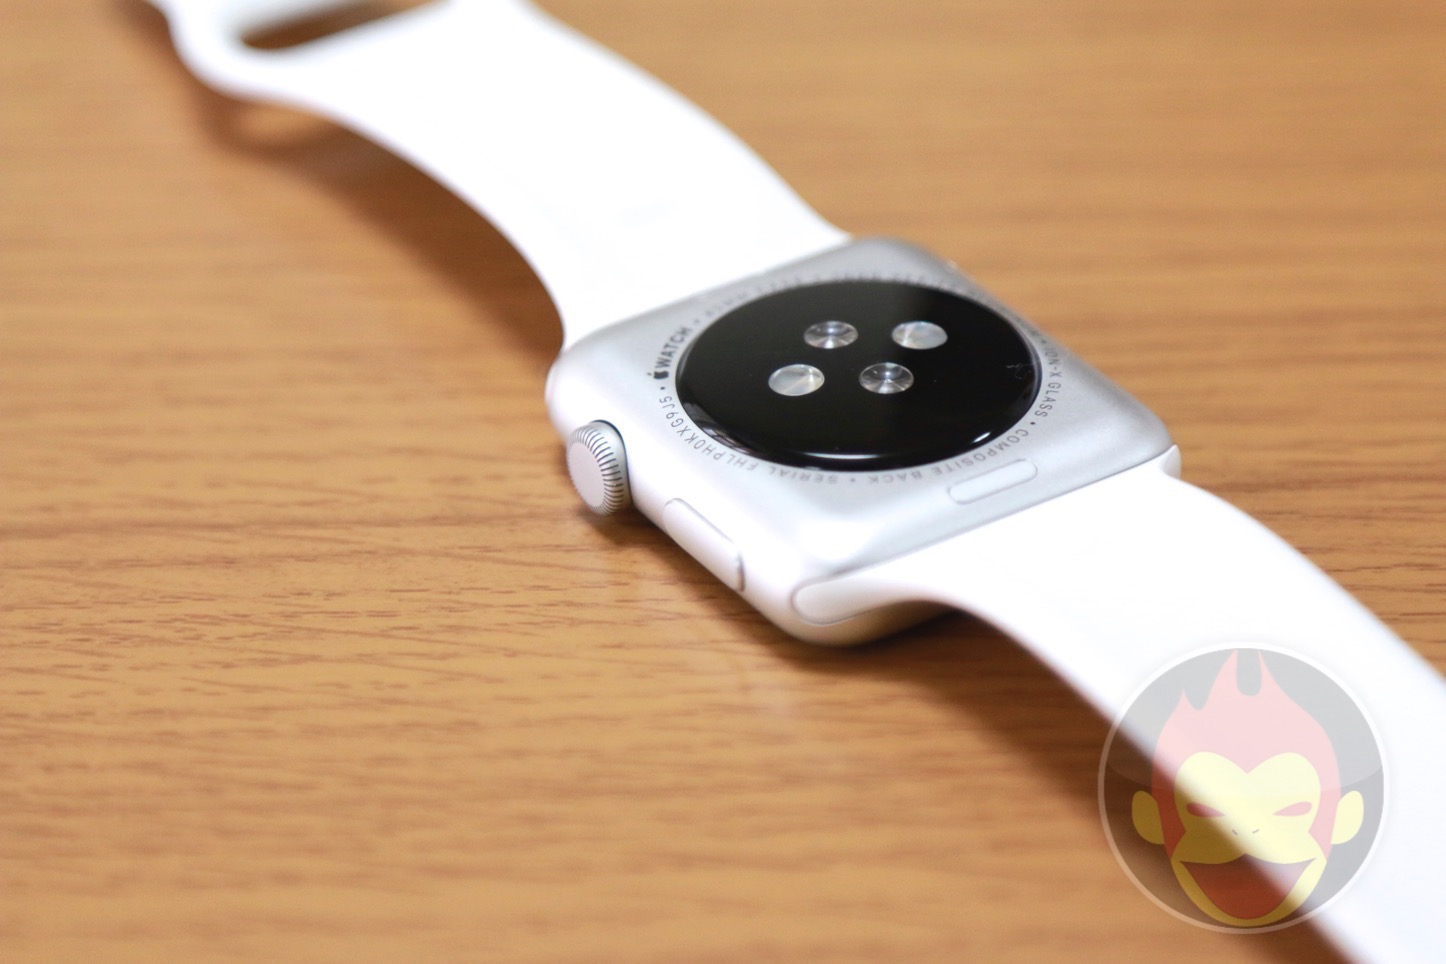 Apple-Watch-Sport-Review-27.jpg